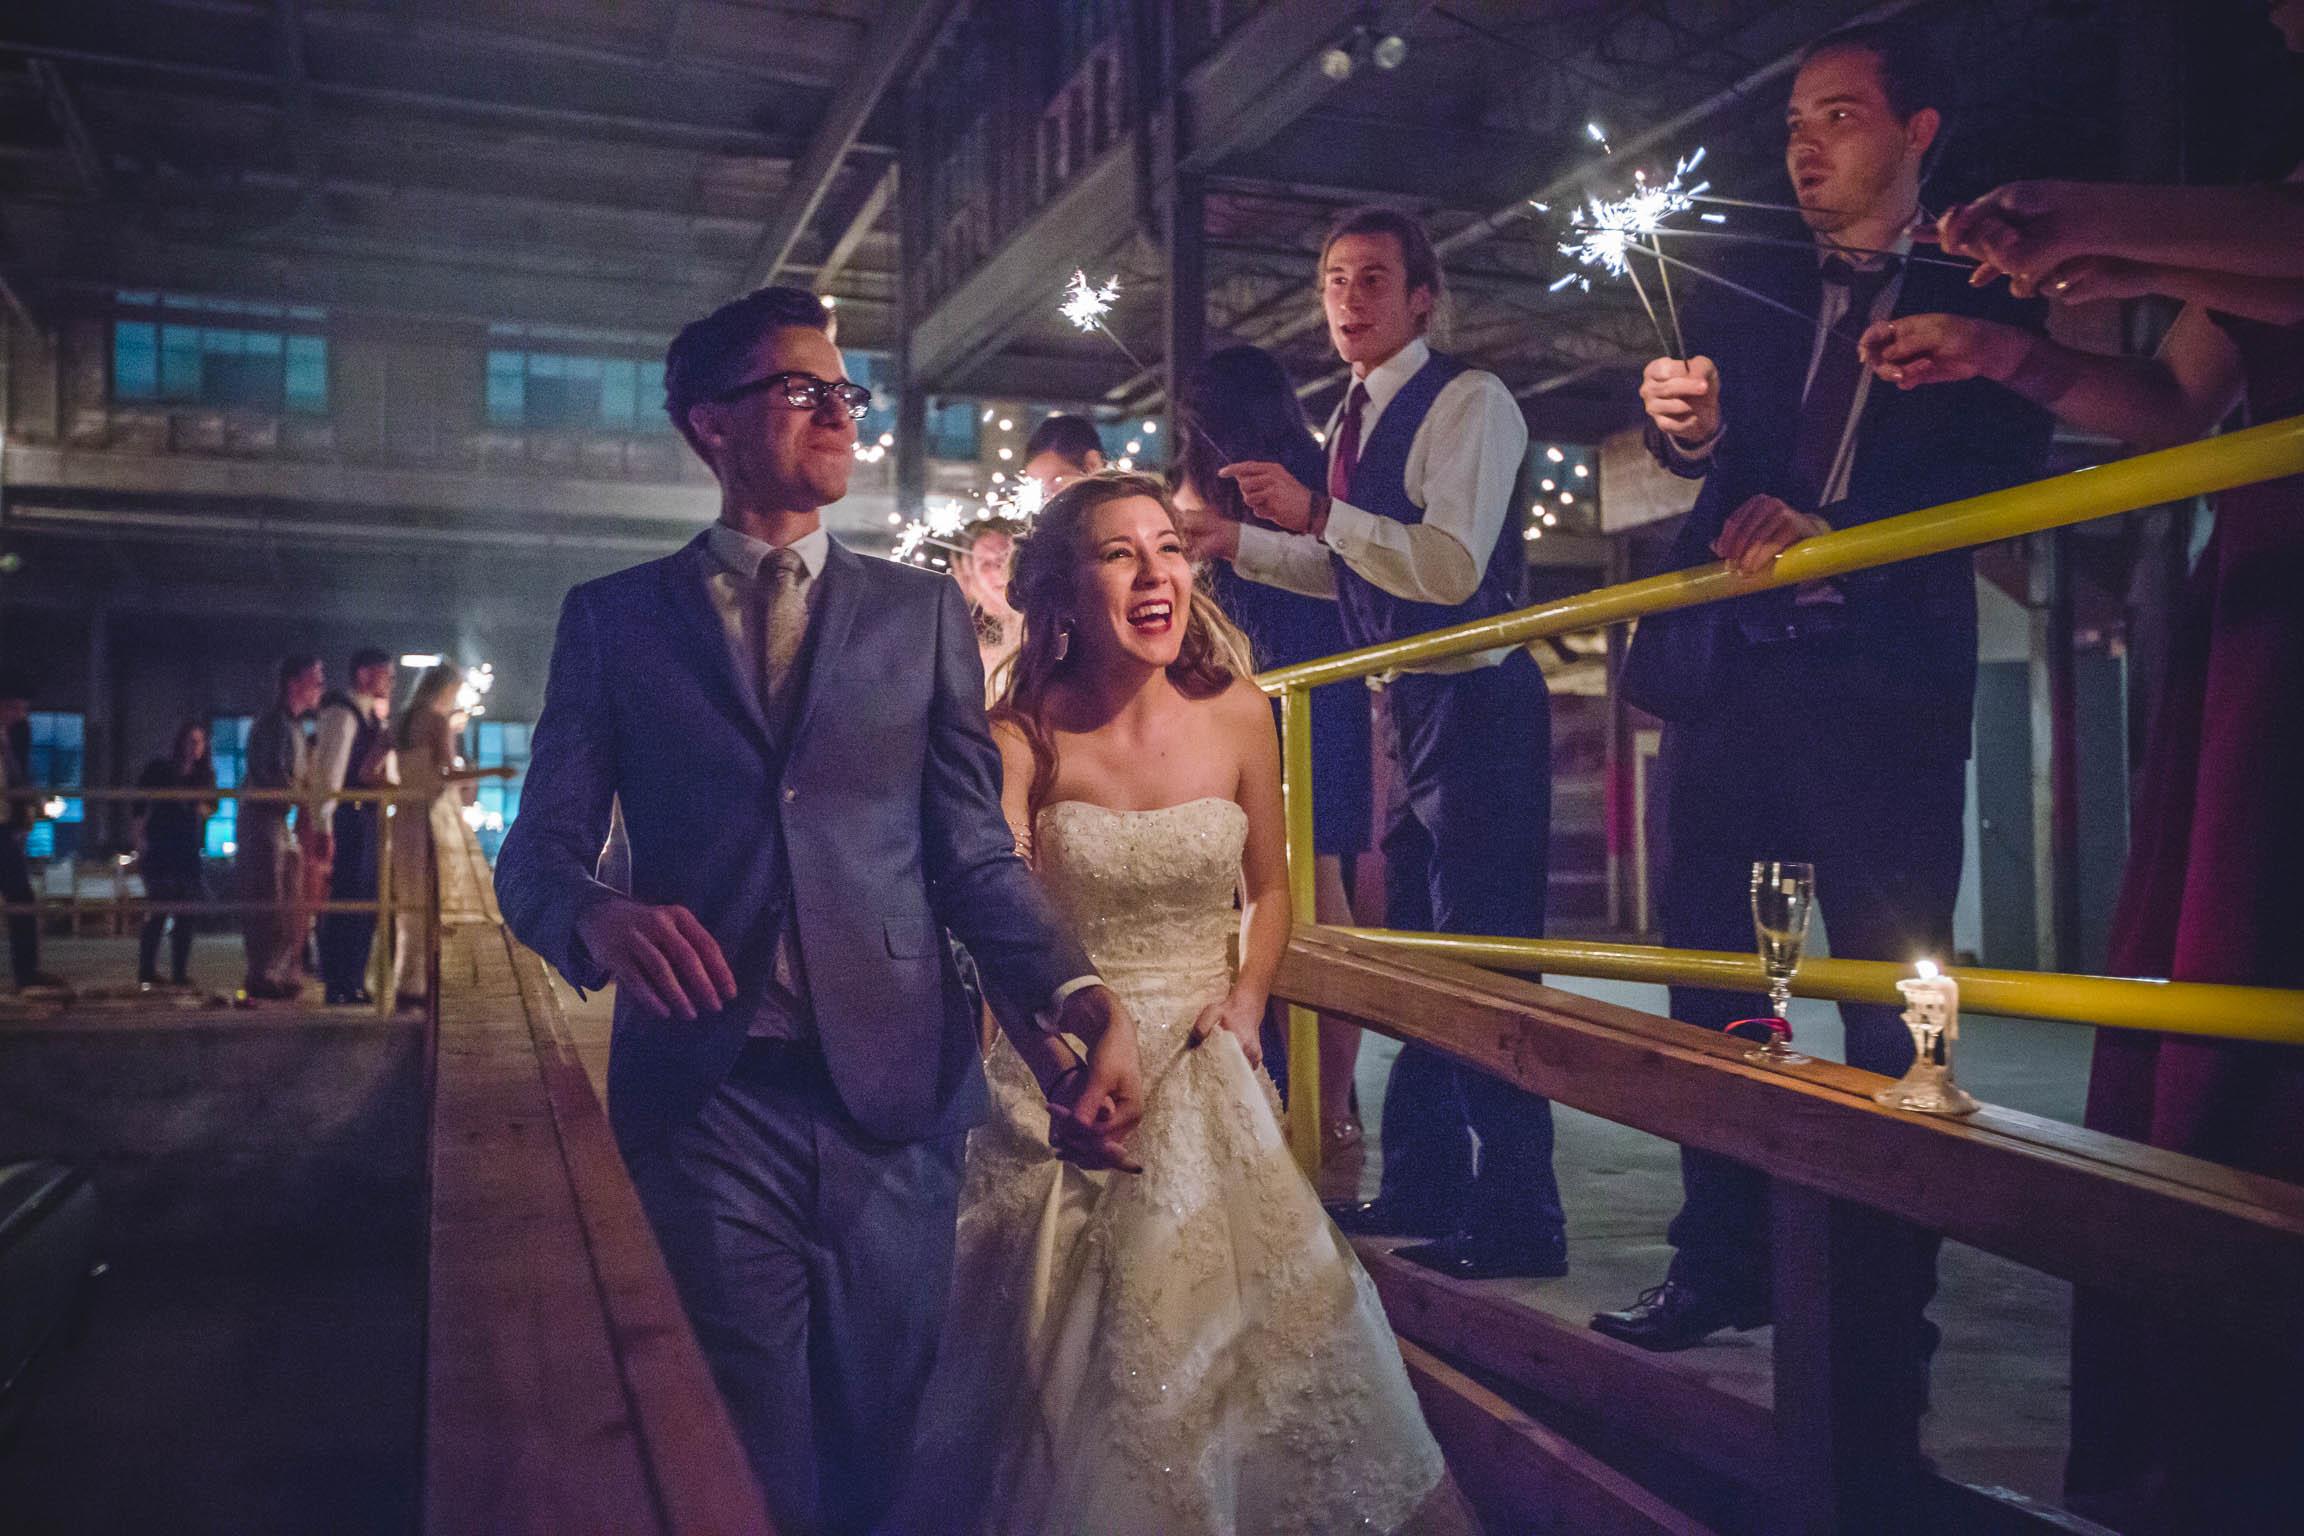 Adam-Szrmack-The-Glass-Factory-Wedding-189.jpg